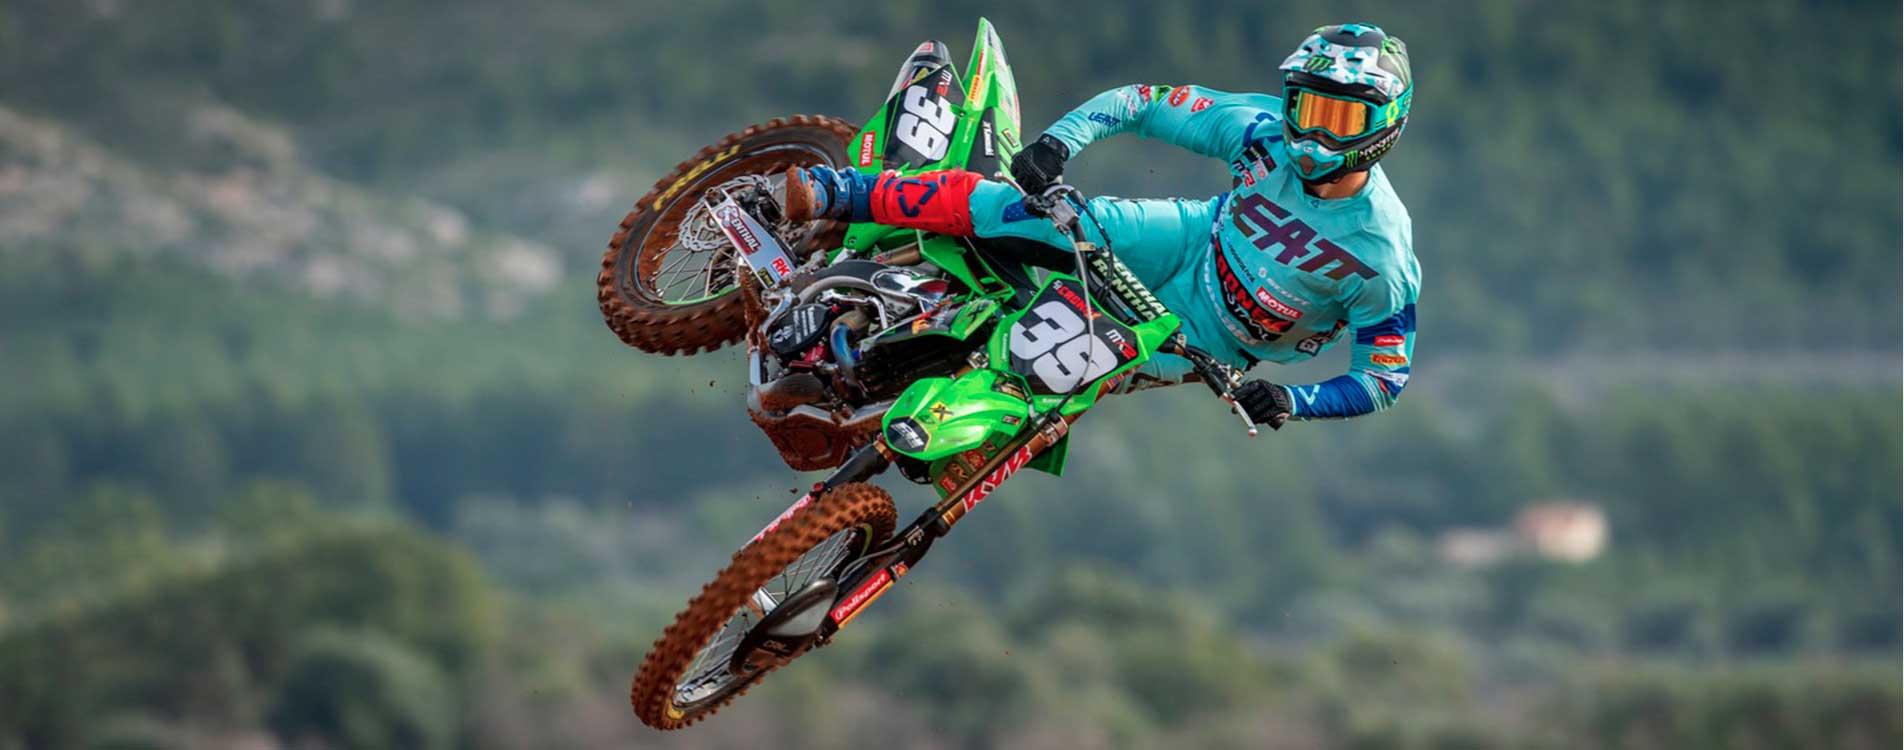 MX Grand Prix Oss